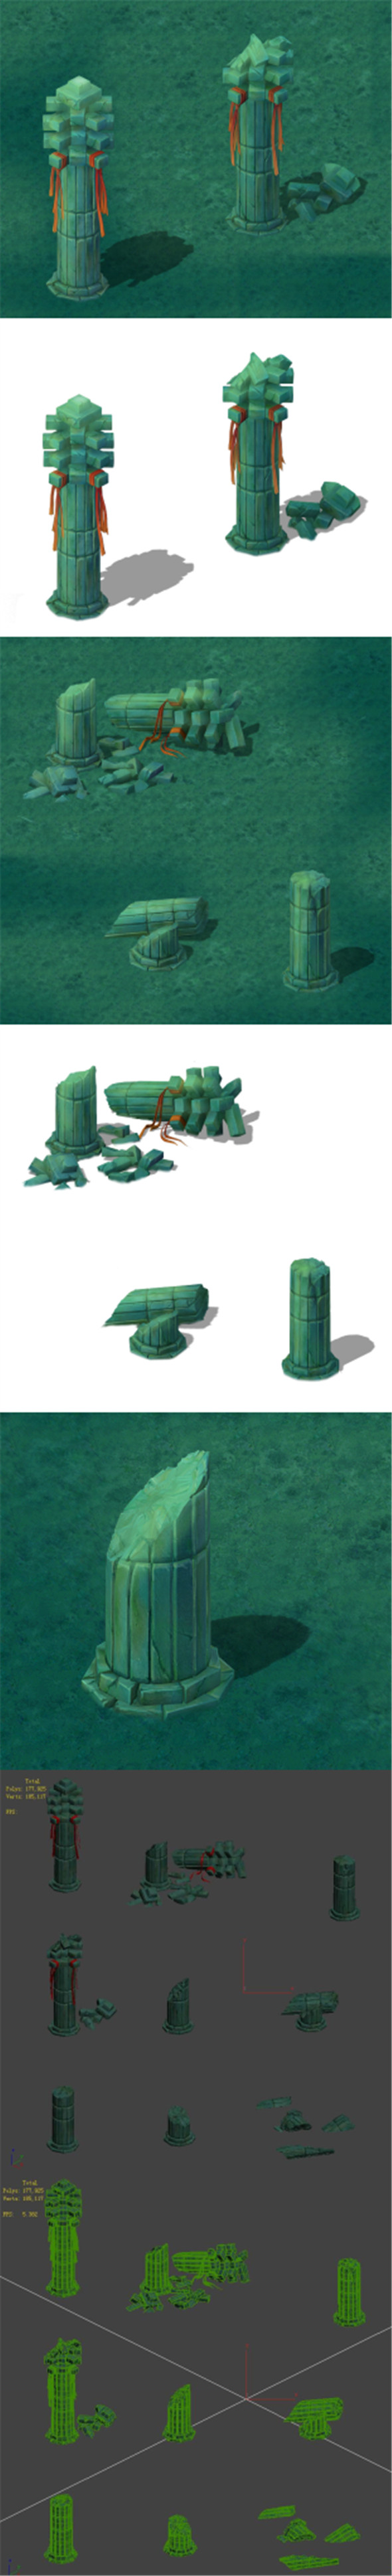 Cartoon version - pyramid front pillar - 3DOcean Item for Sale